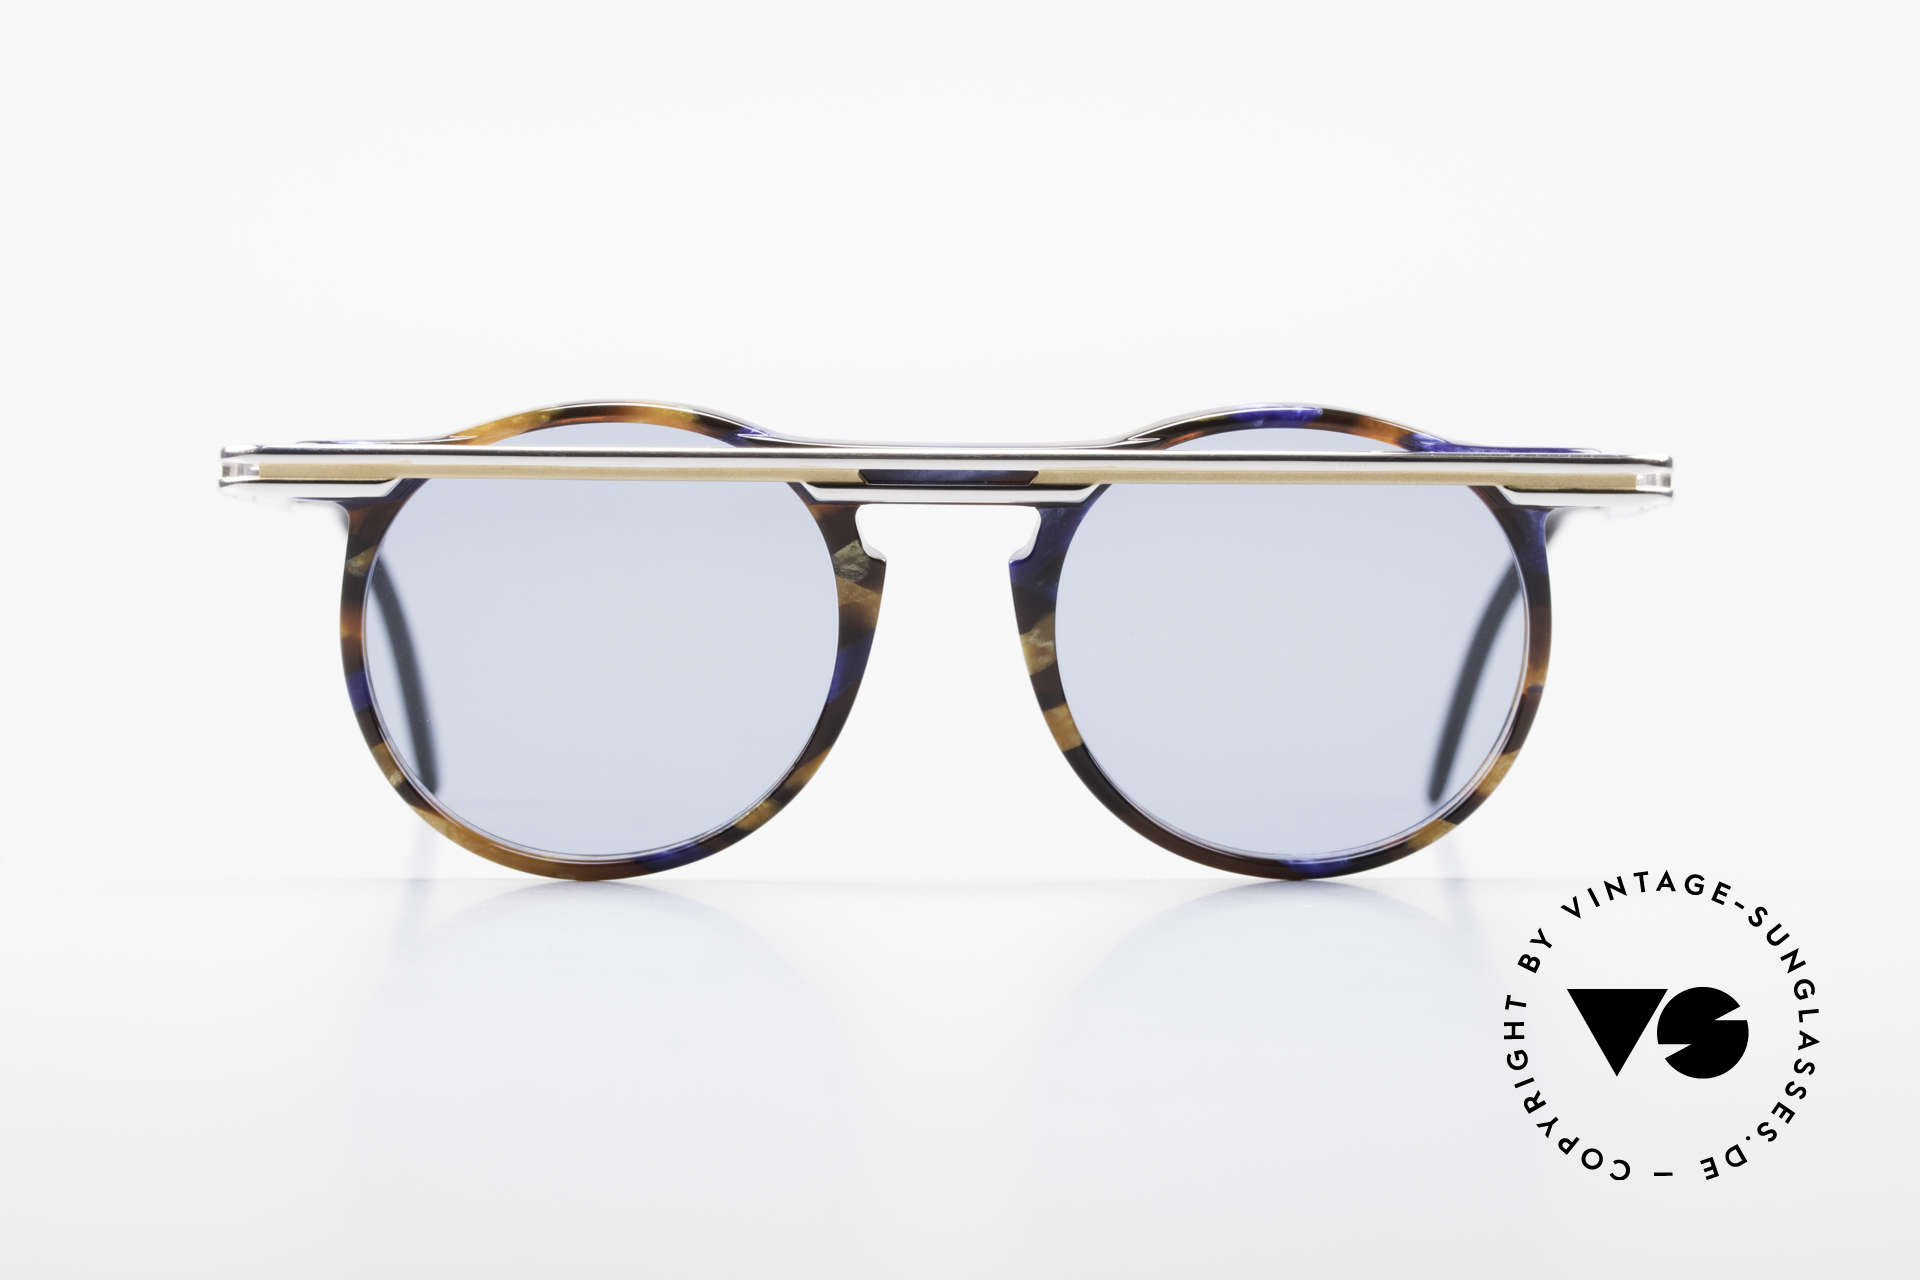 Cazal 648 Old Cari Zalloni Sunglasses, worn by the designer - Cari Zalloni (see the booklet), Made for Men and Women